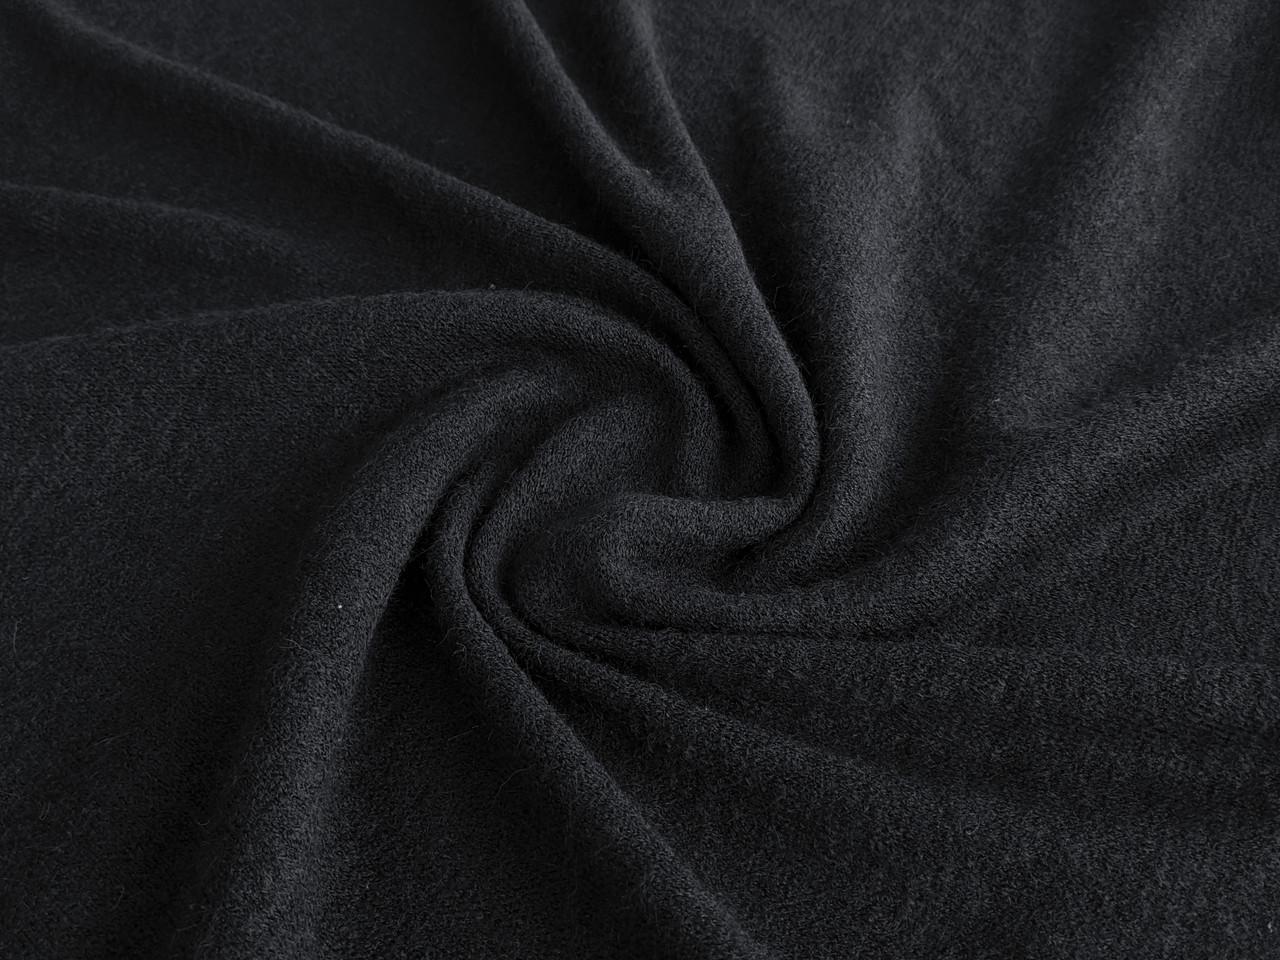 Трикотаж ангора Арктика, черный